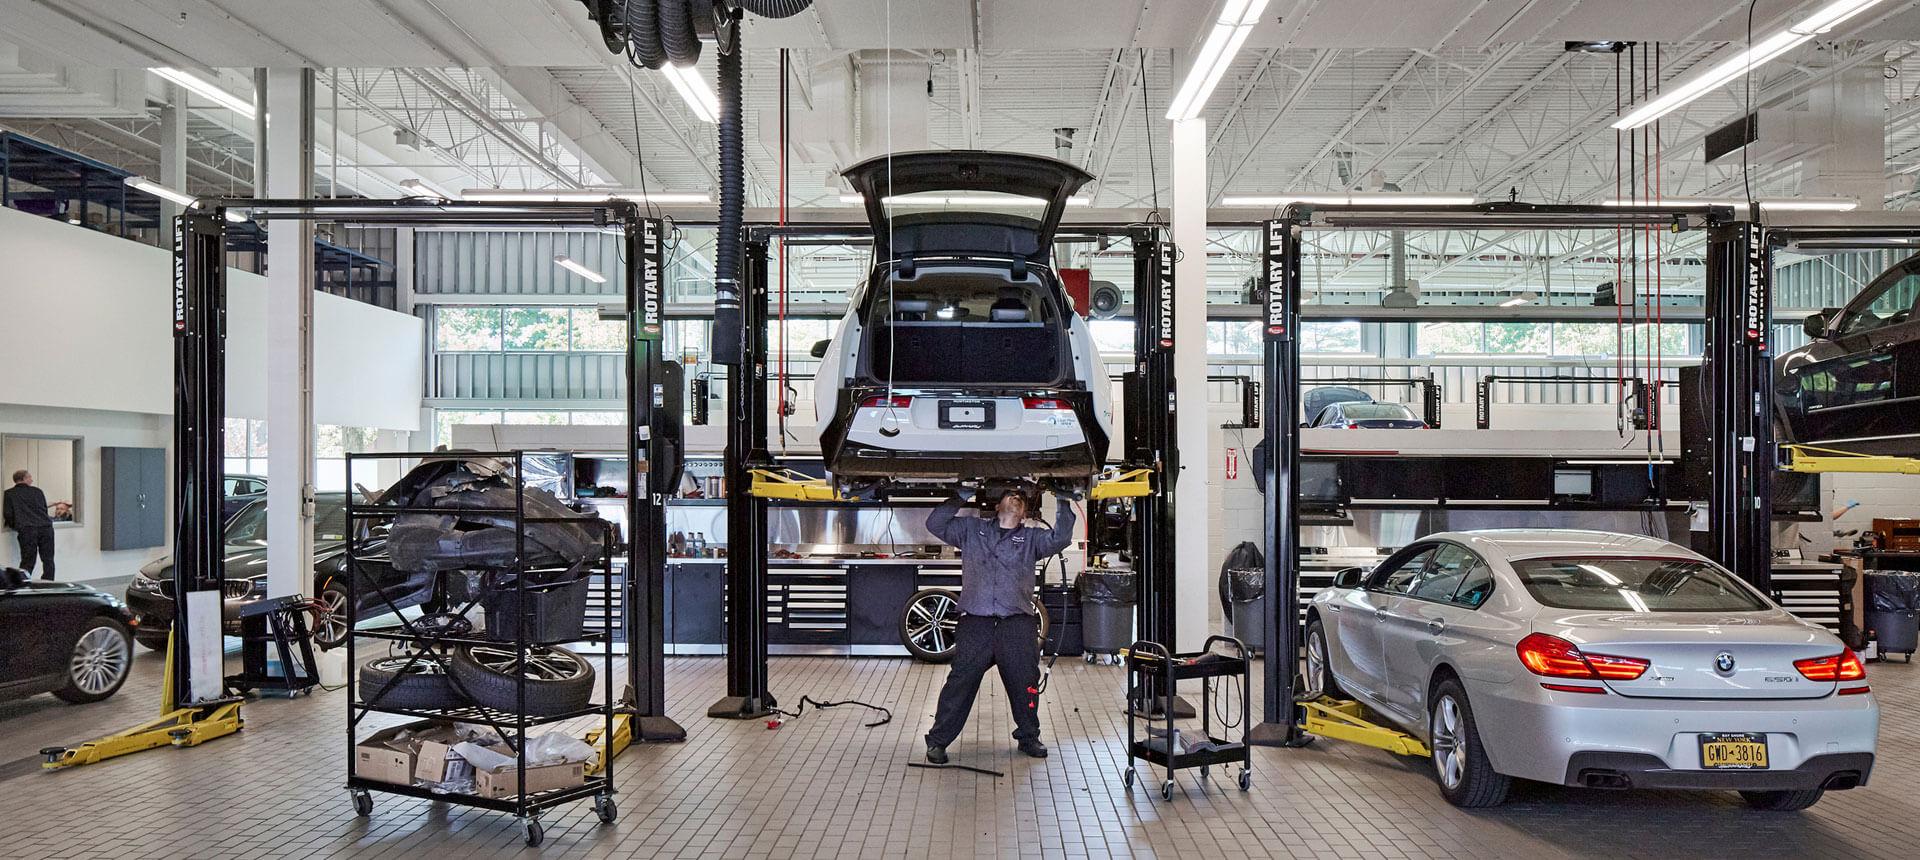 Habberstad BMW Huntington Station, New York Garage